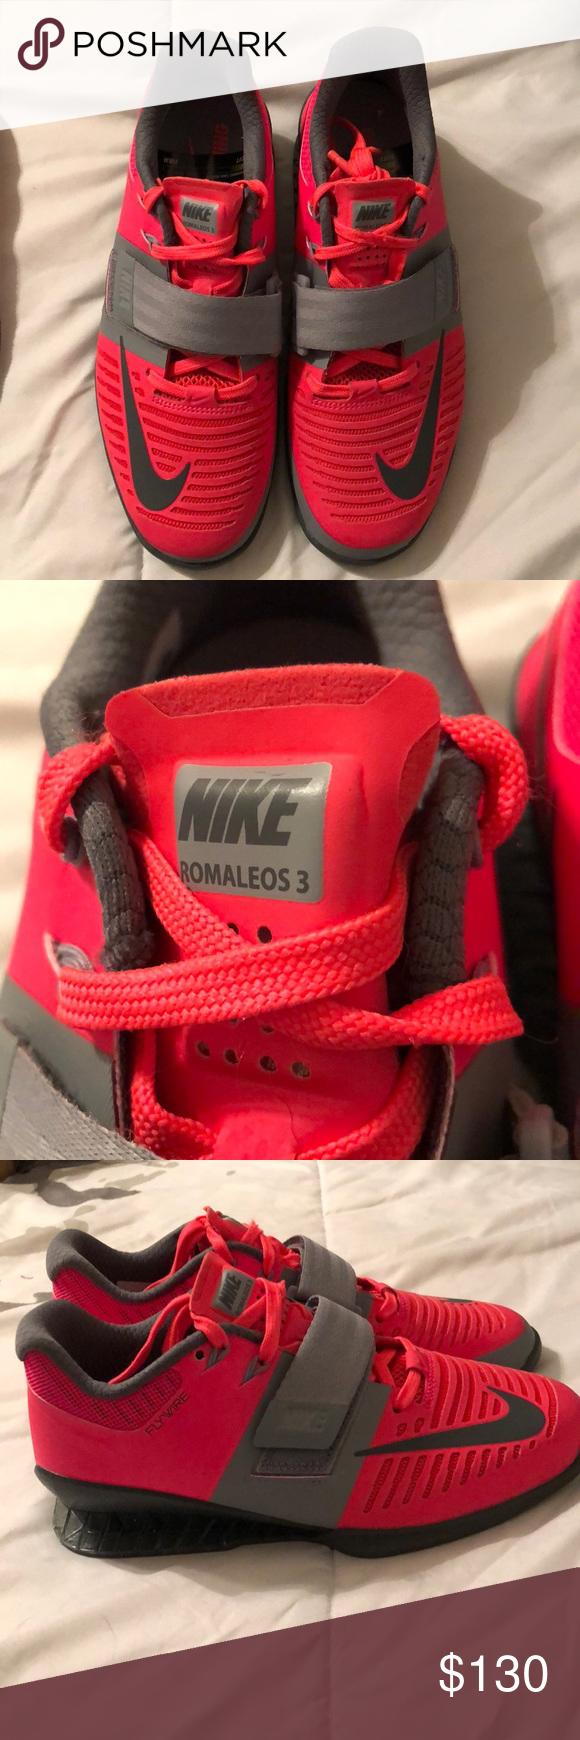 Women s size 7 Solar red Grey Nike Romaleos 3 Never worn 02221ae35